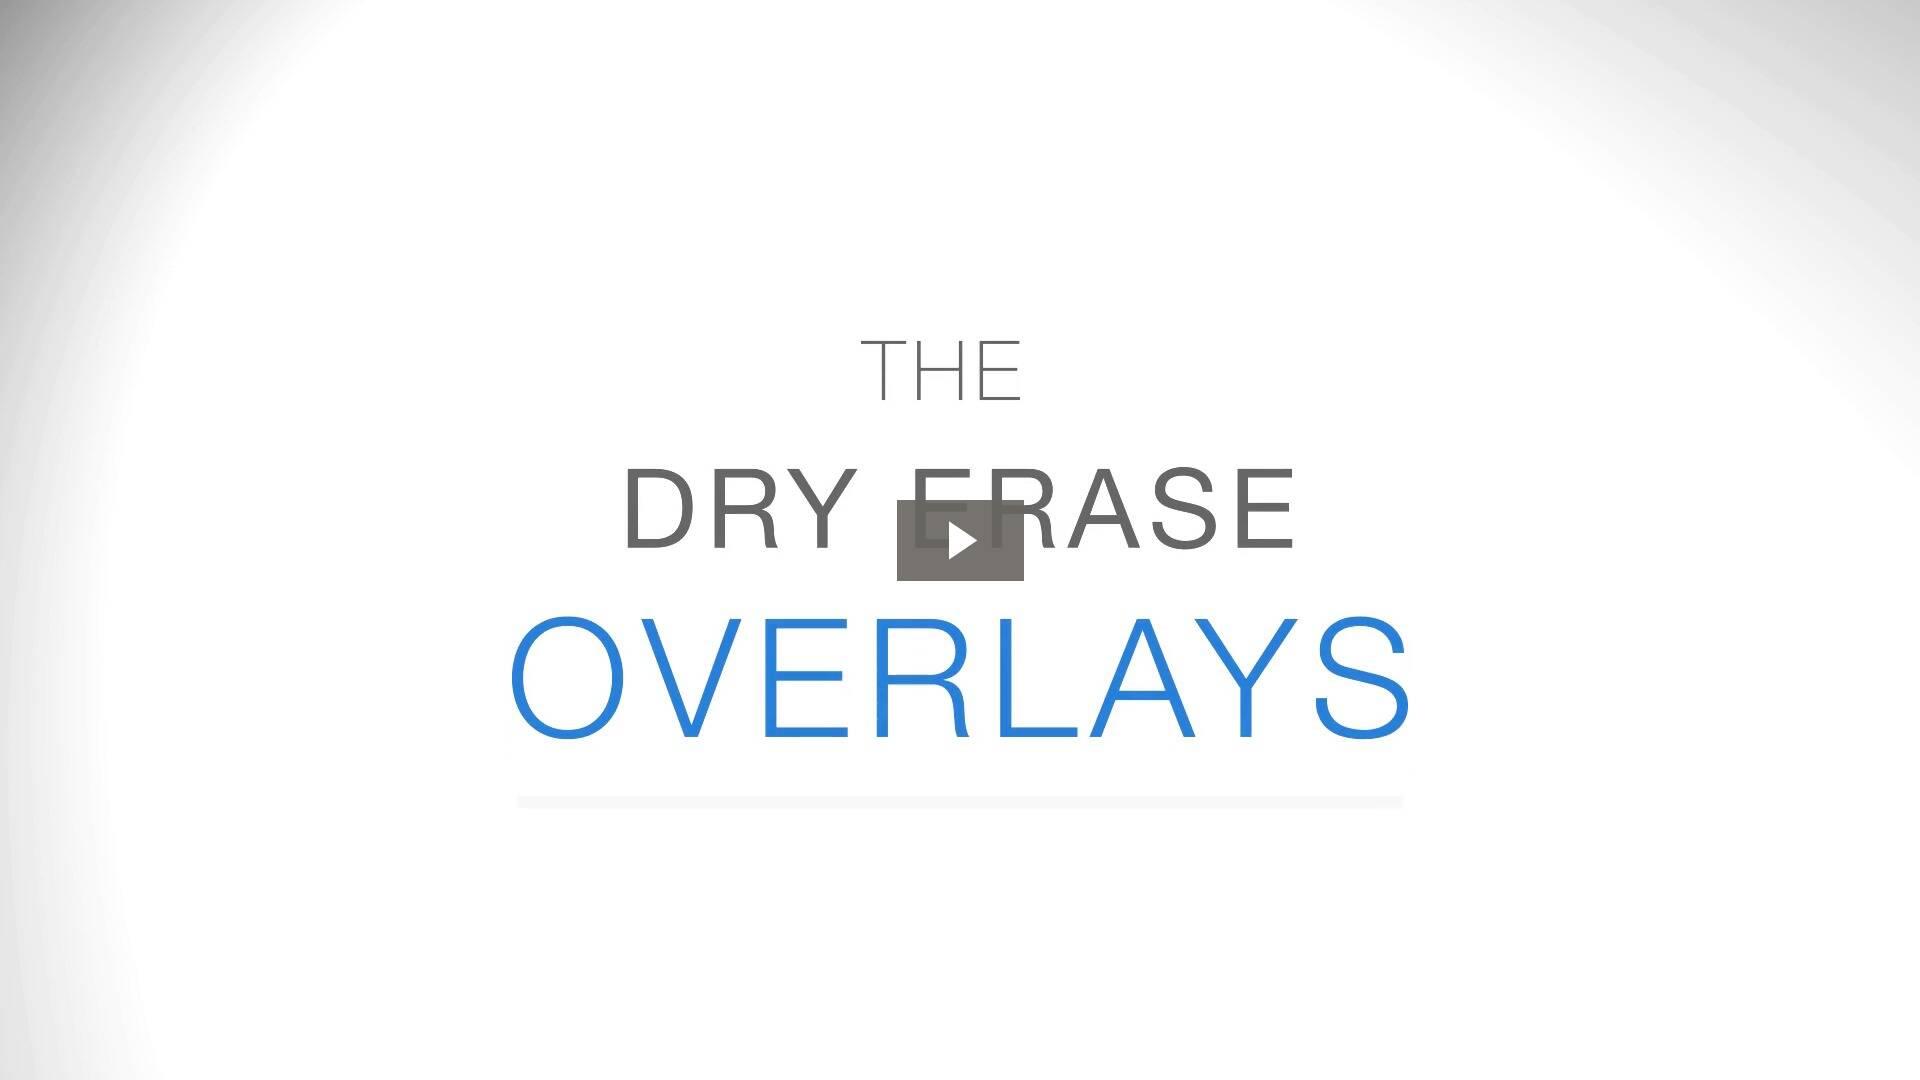 The Dry Erase Overlays